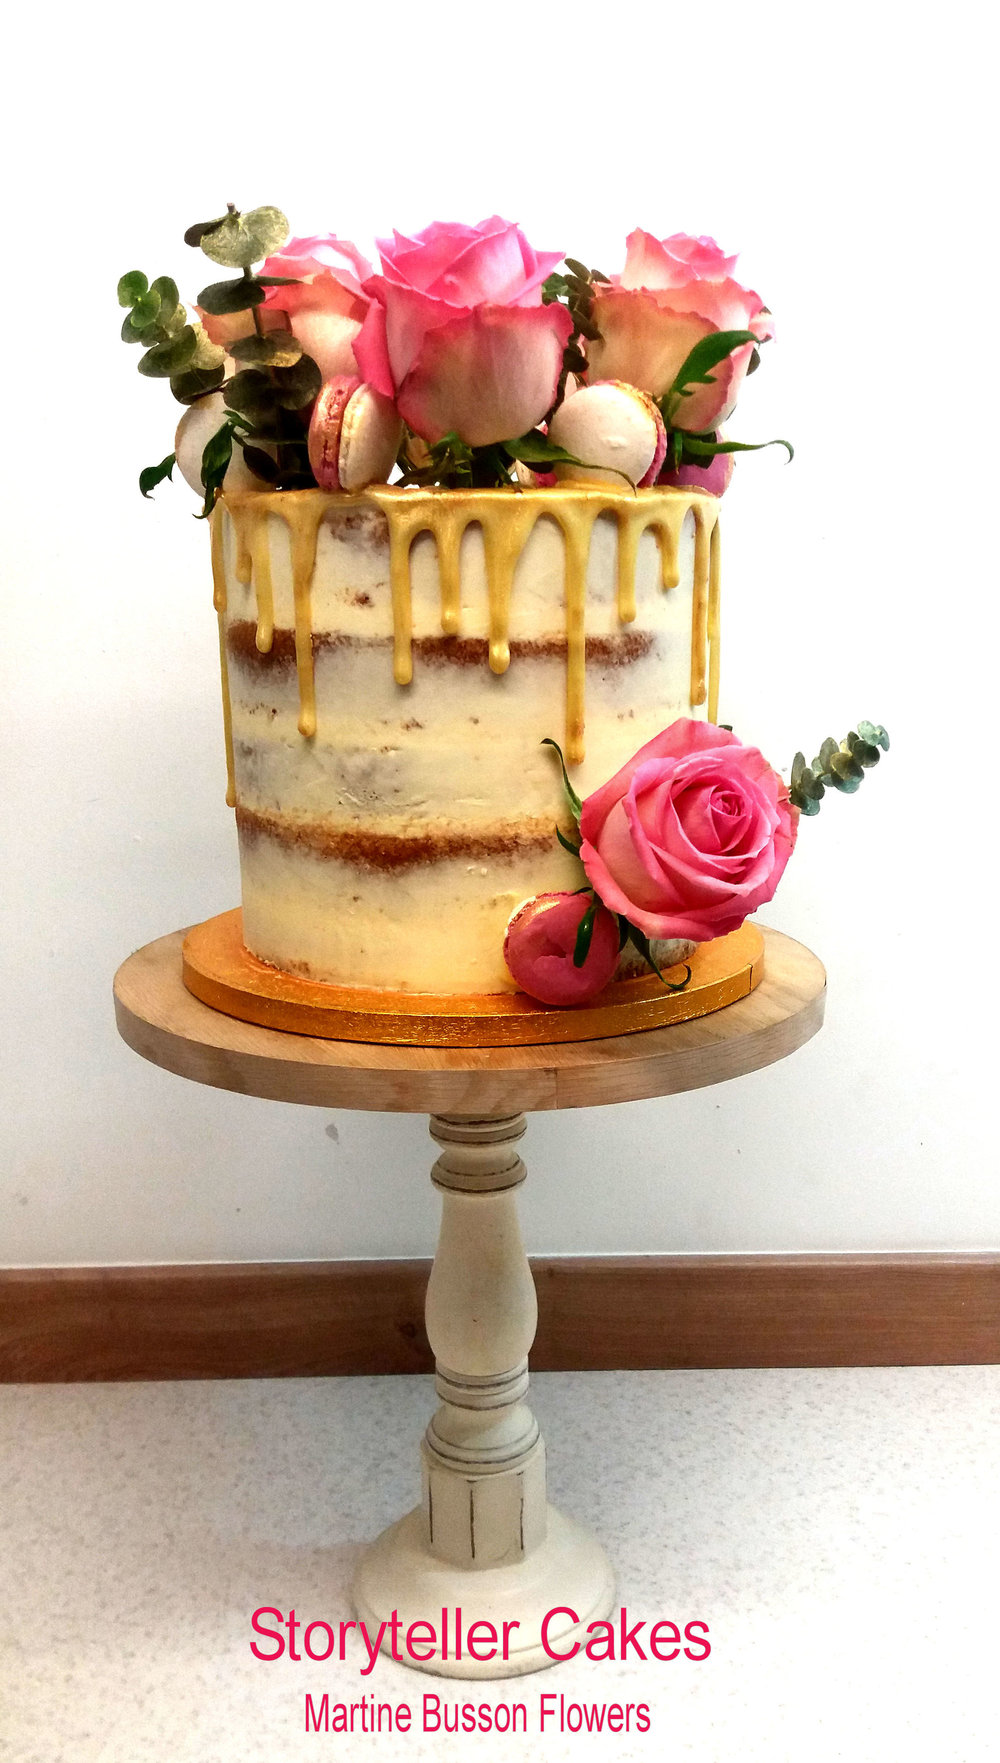 floral drip cake 1.jpg